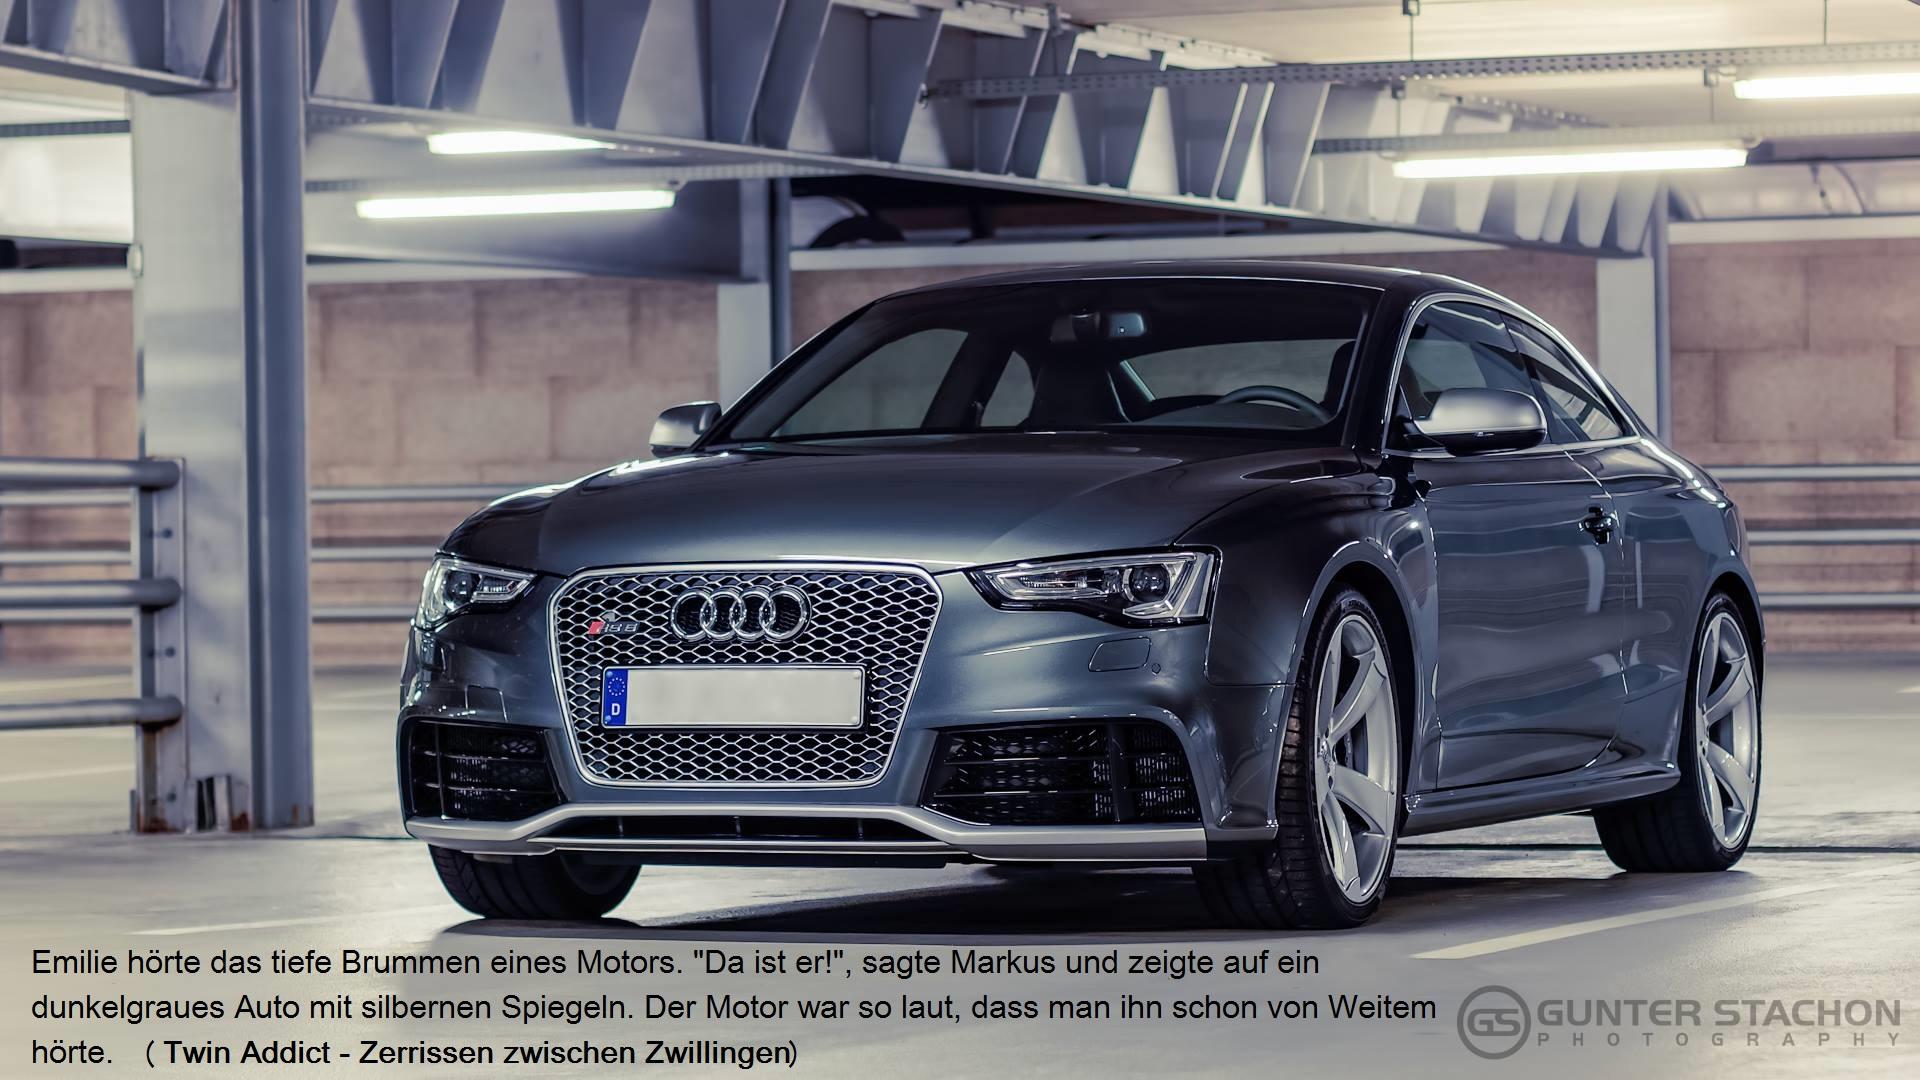 Twin Addict Audi RS5